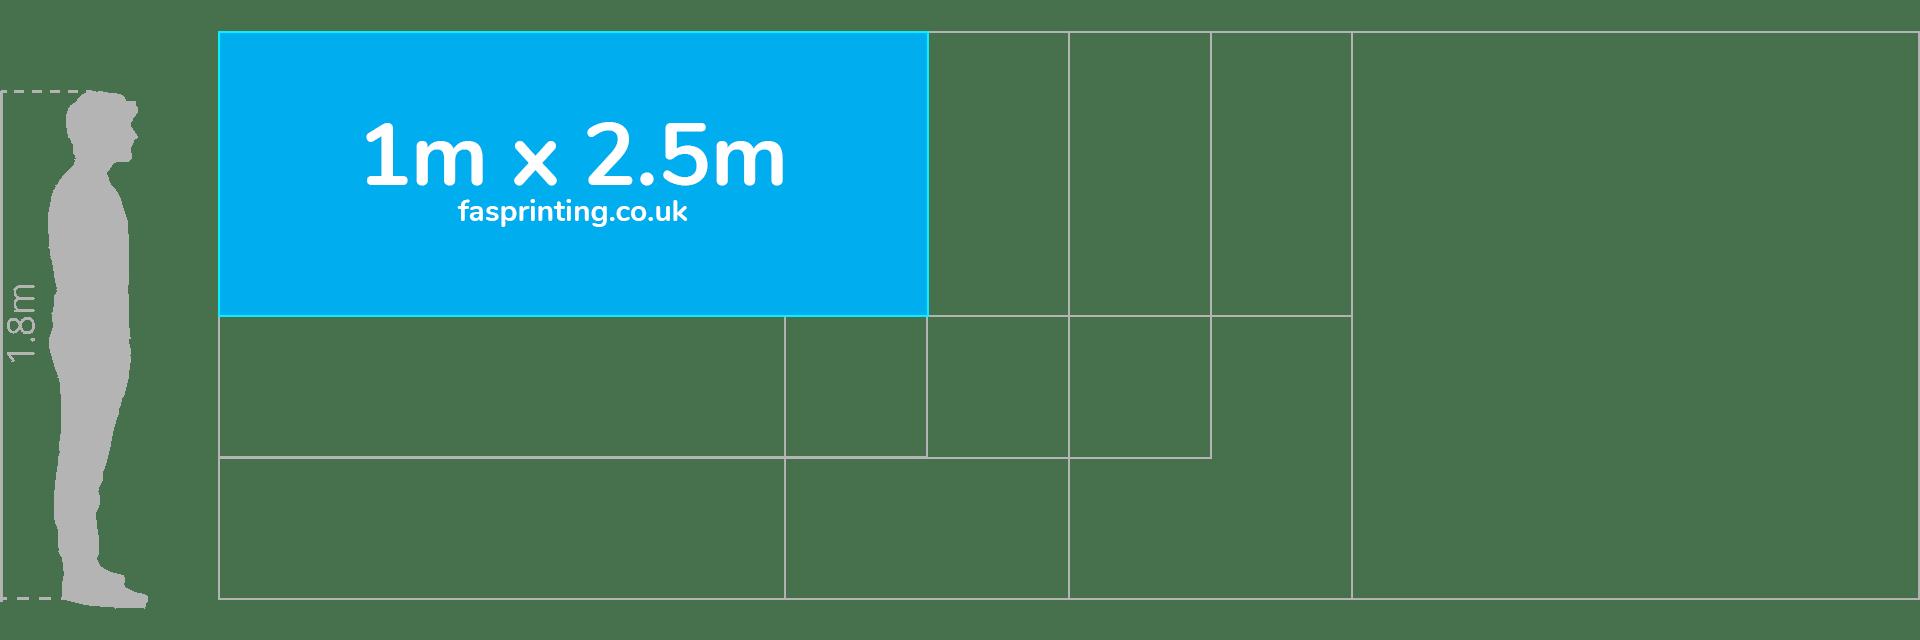 1m x 2.5m Banner